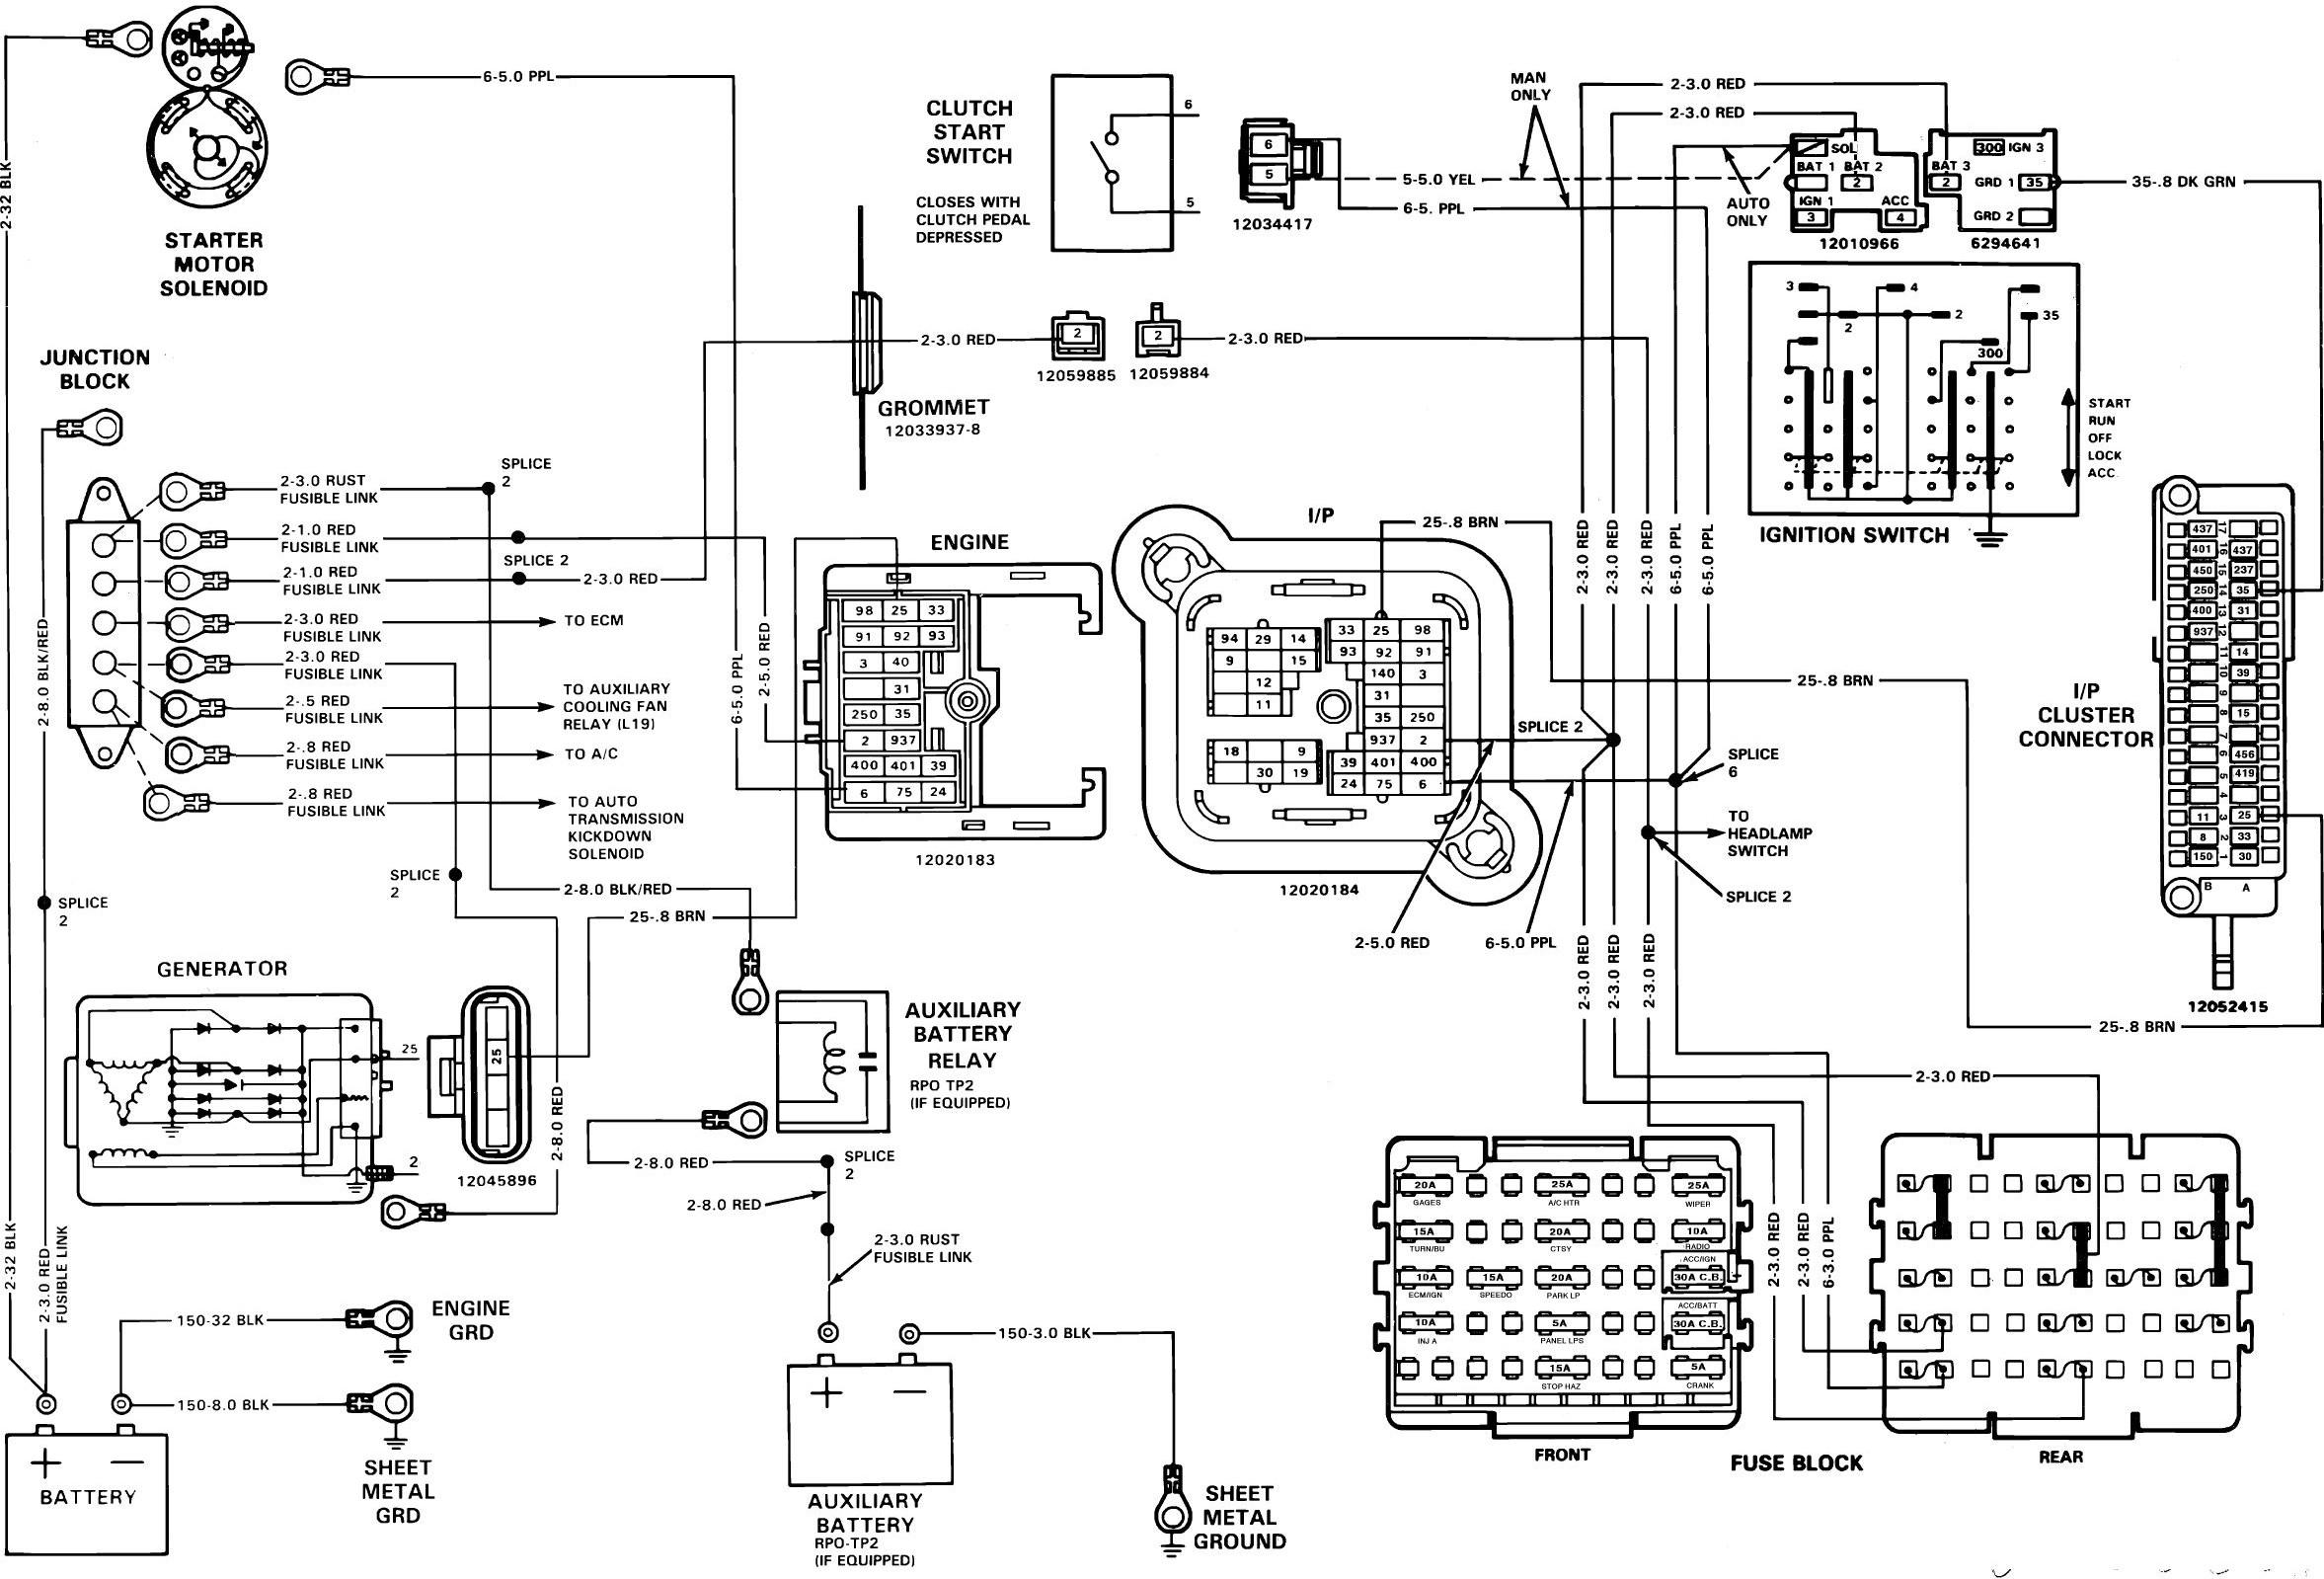 [XOTG_4463]  WL_7973] 1988 Chevy 1500 Ignition Switch Wiring Diagram | 1988 Chevy Ignition Switch Wiring Diagram |  | Tobiq Knie Itive Urga Cette Nnigh Timew Inrebe Mohammedshrine Librar Wiring  101